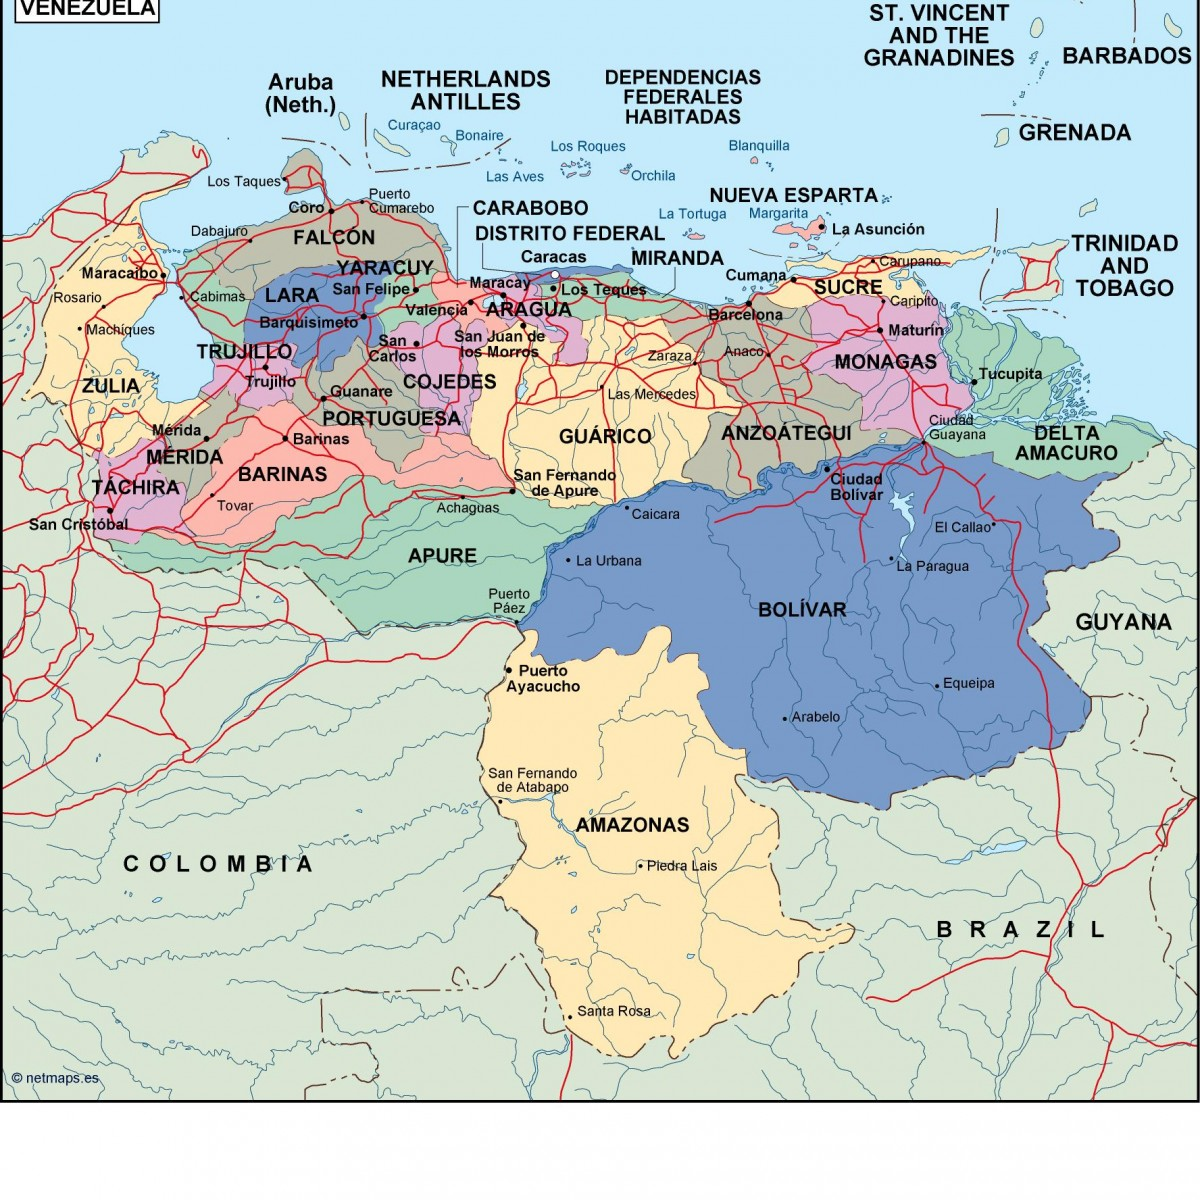 venezuela political map Eps Illustrator Map Our cartographers